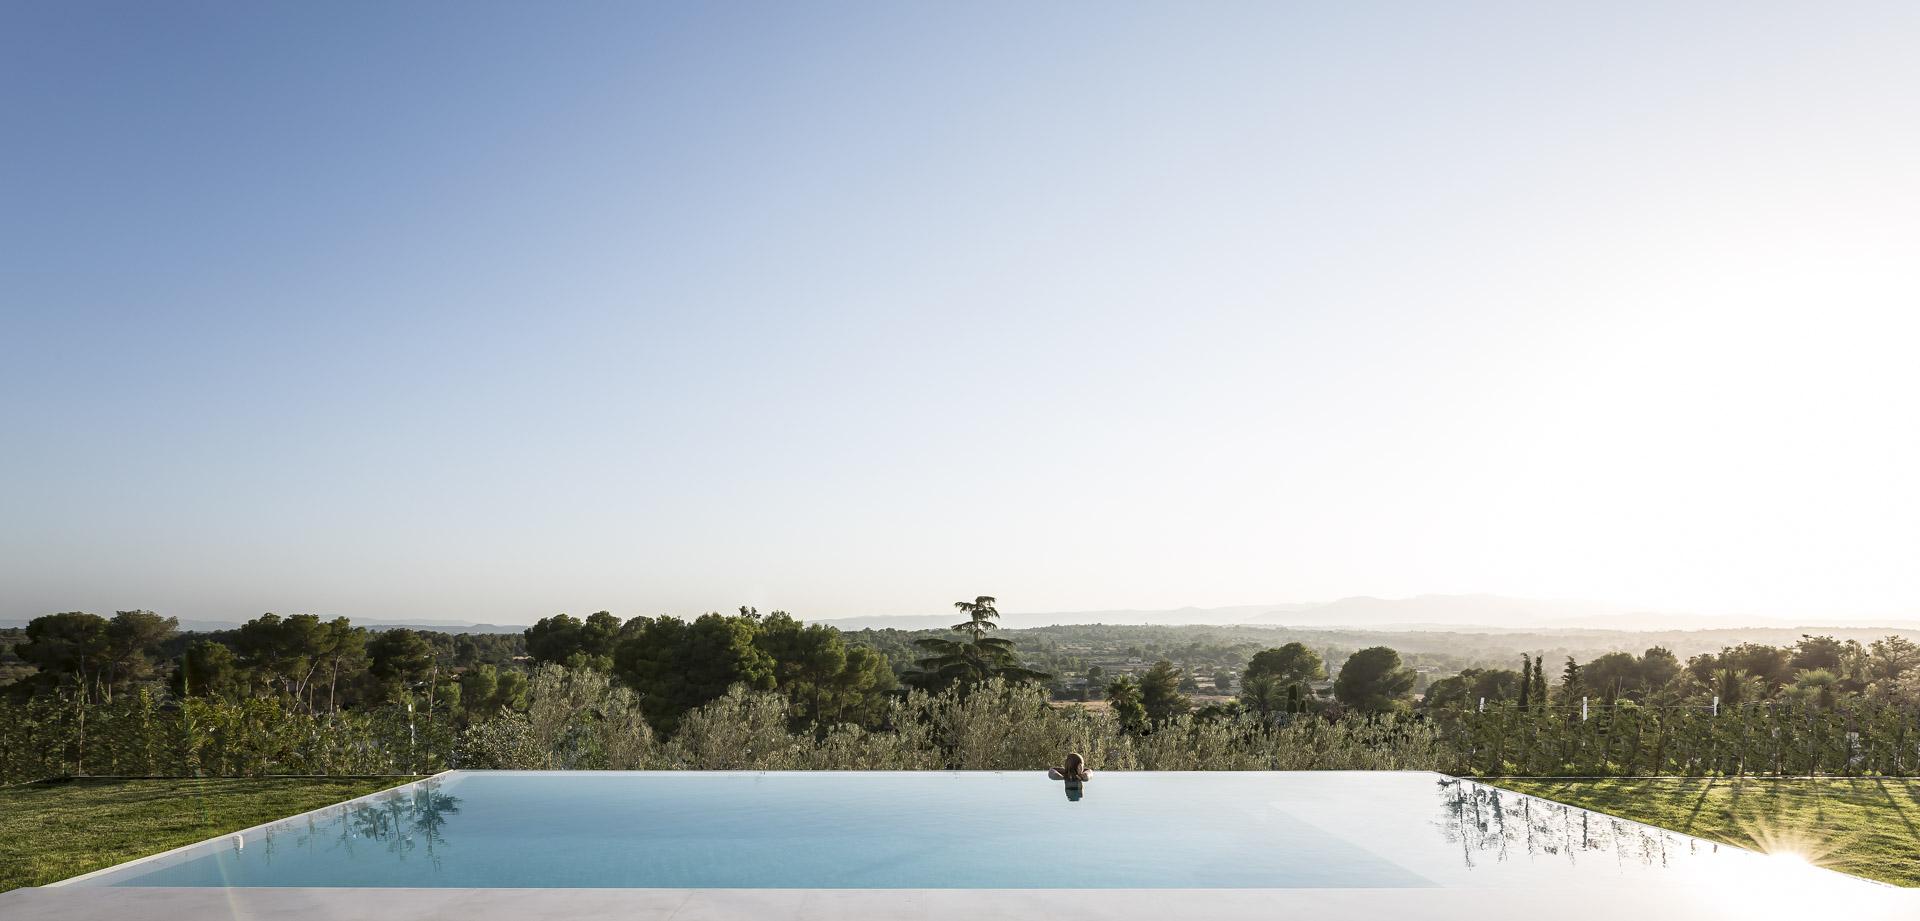 fotografia-arquitectura-valencia-german-cabo-gallardo-llopis-villamarchante-vivienda-49